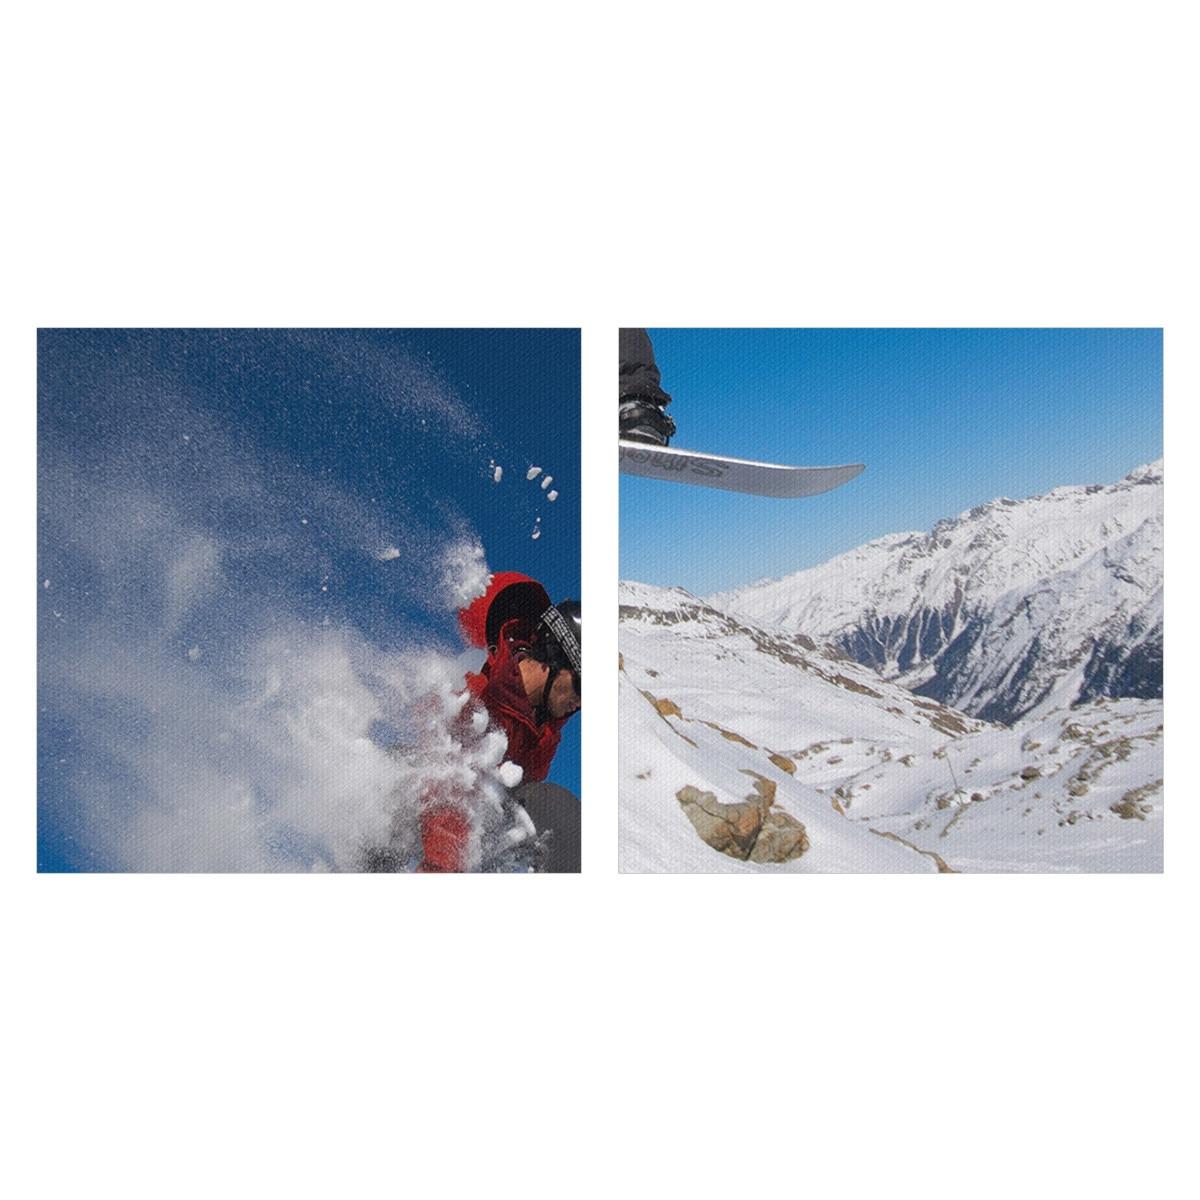 Snowboarding | Iunie